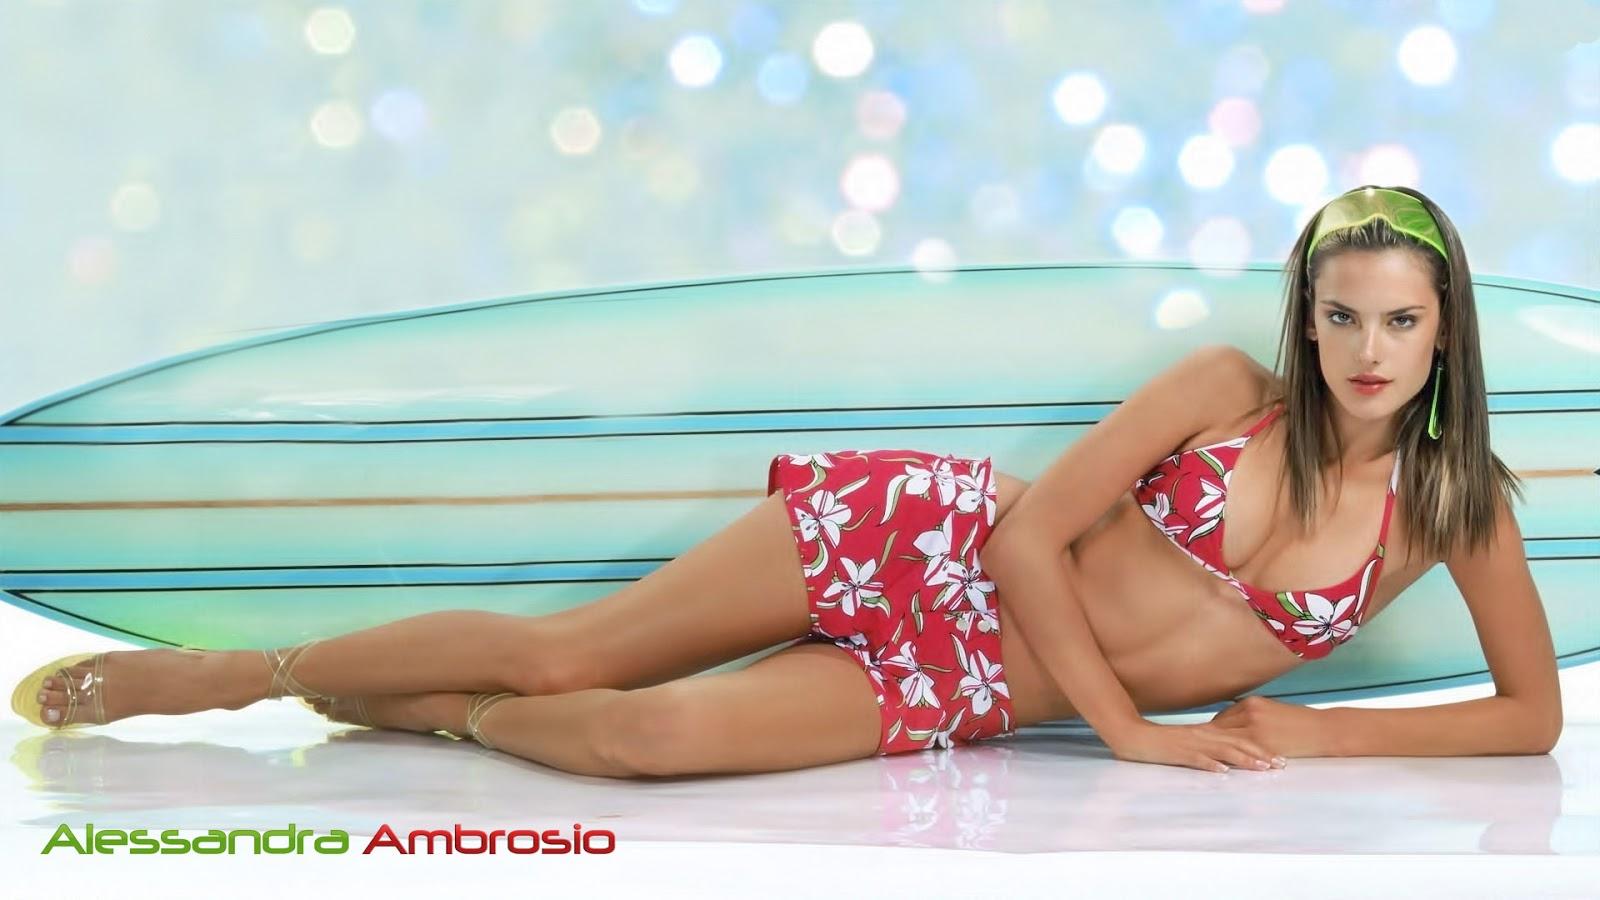 Alessandra Ambrosio Styles HD Wallpaper